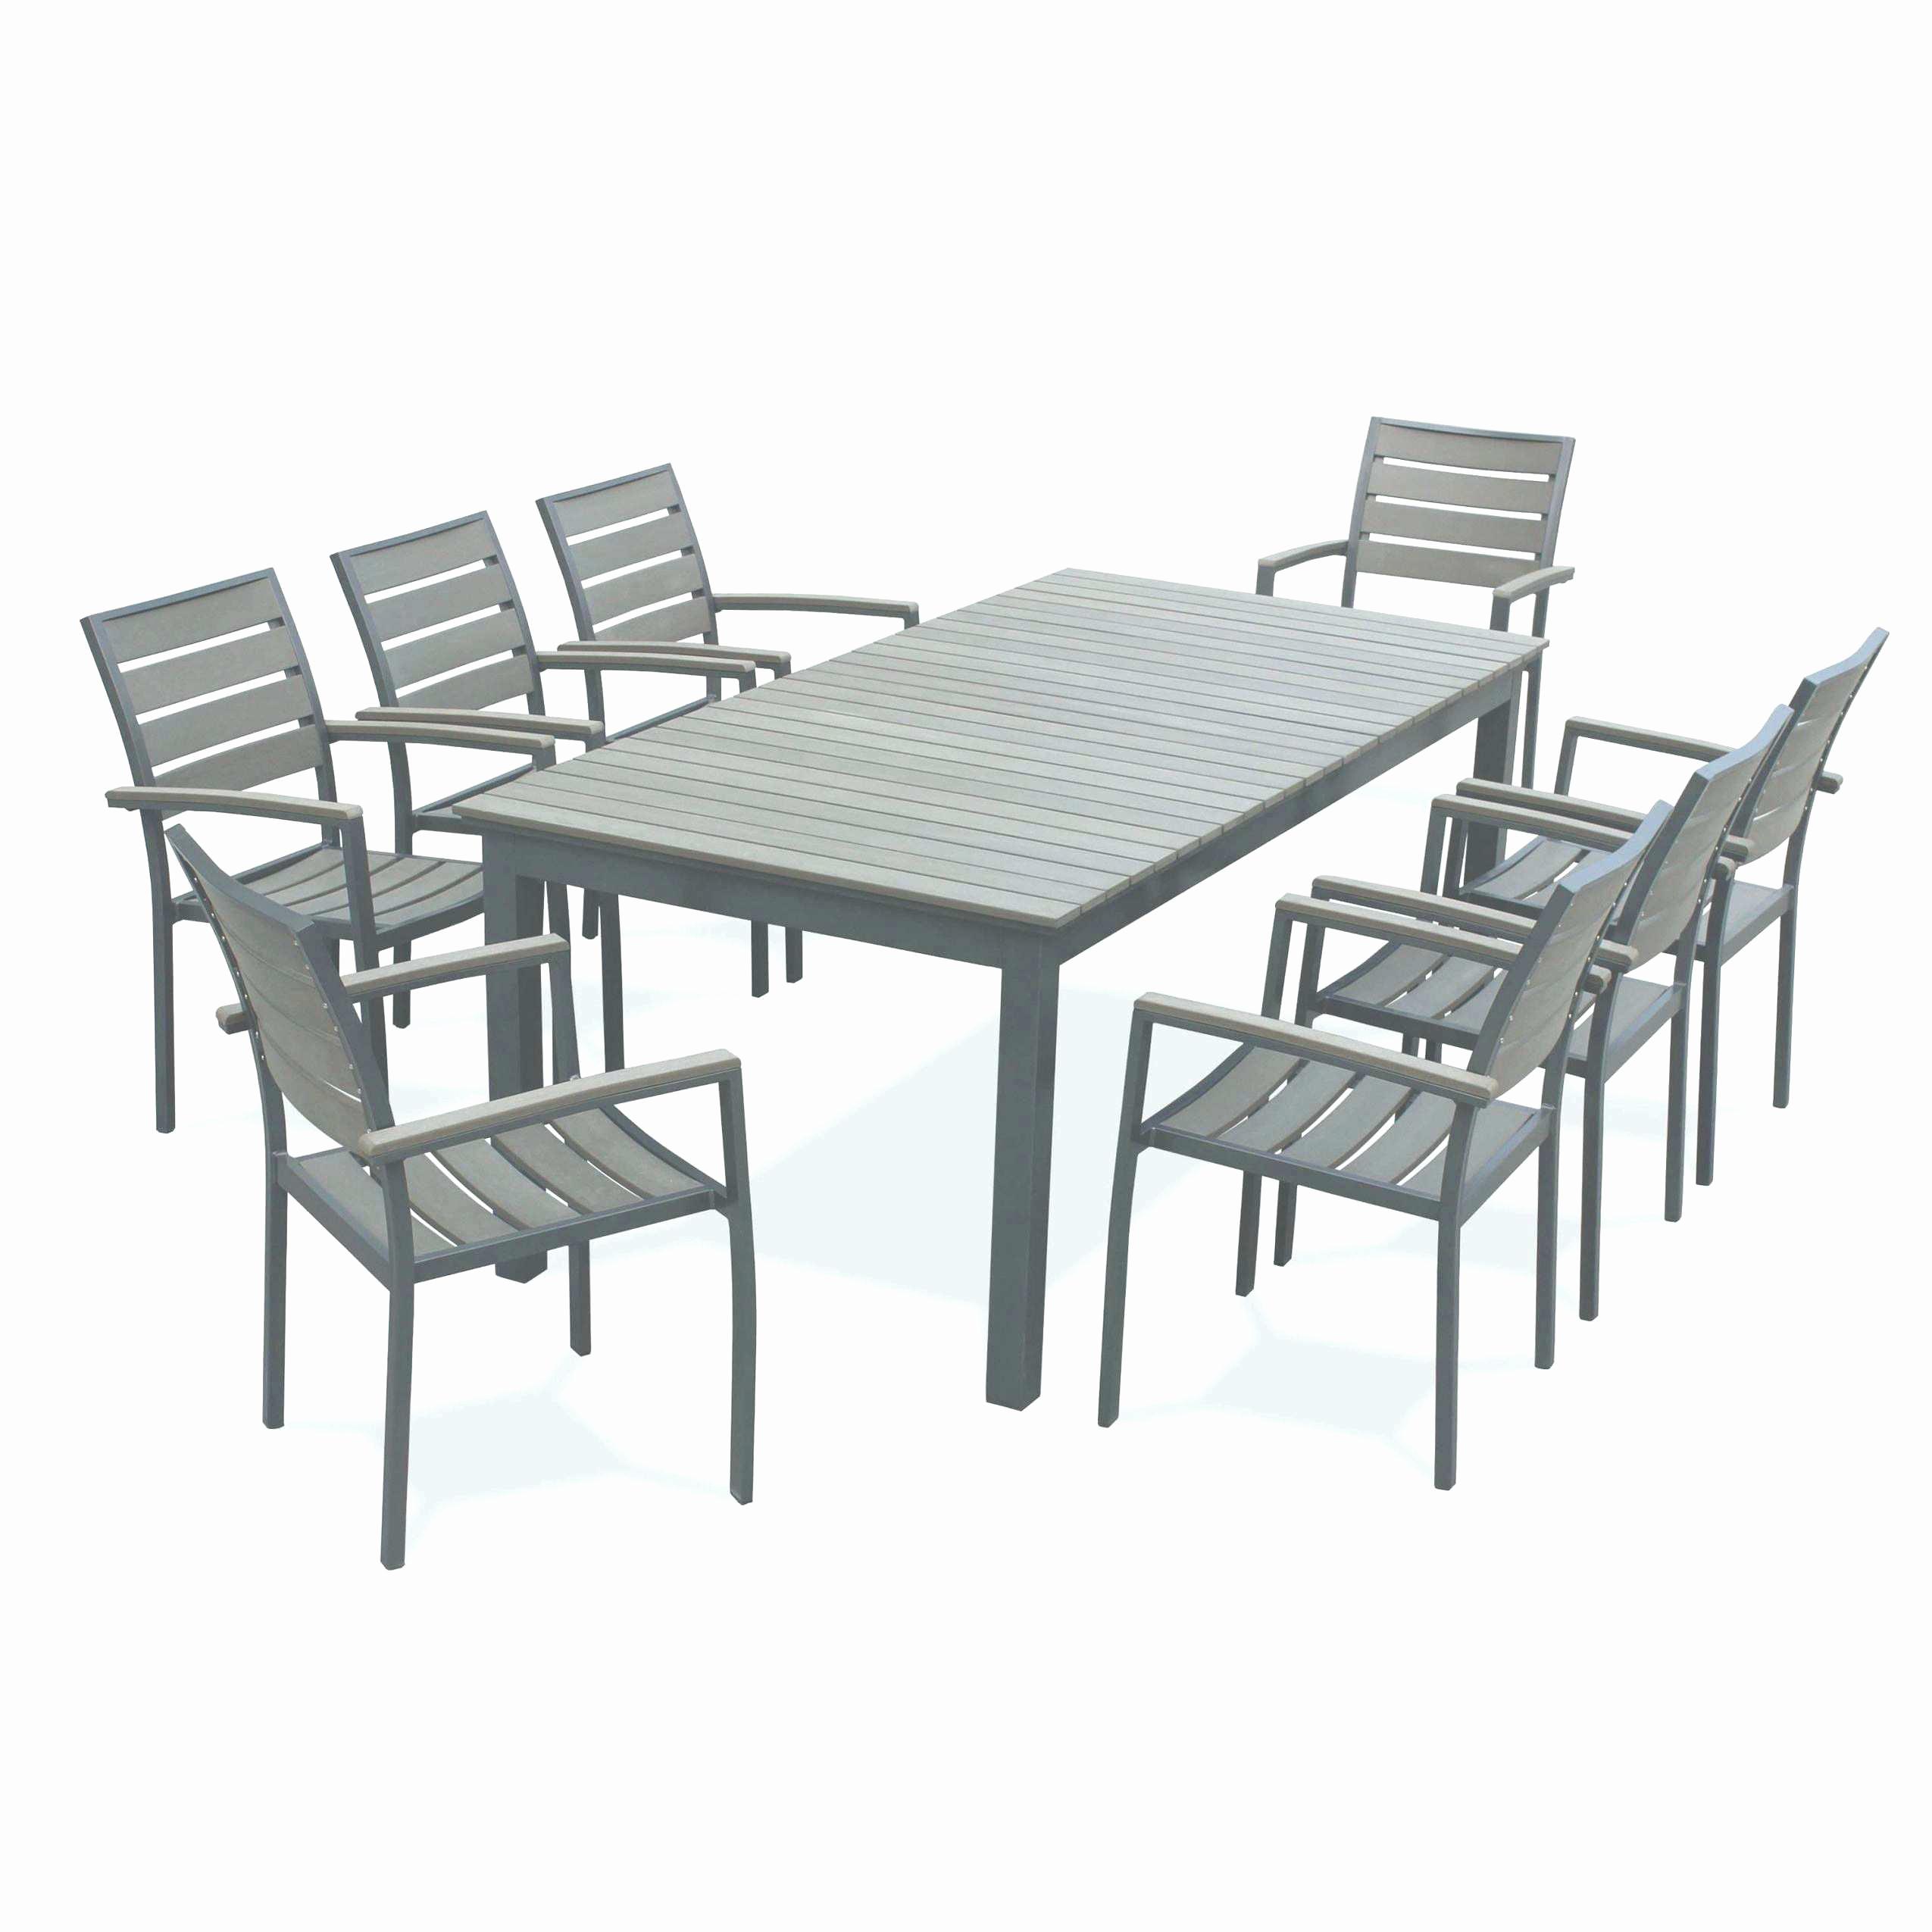 table basse jardin castorama inspire chaises de jardin castorama le meilleur de 45 meilleur de image de of table basse jardin castorama